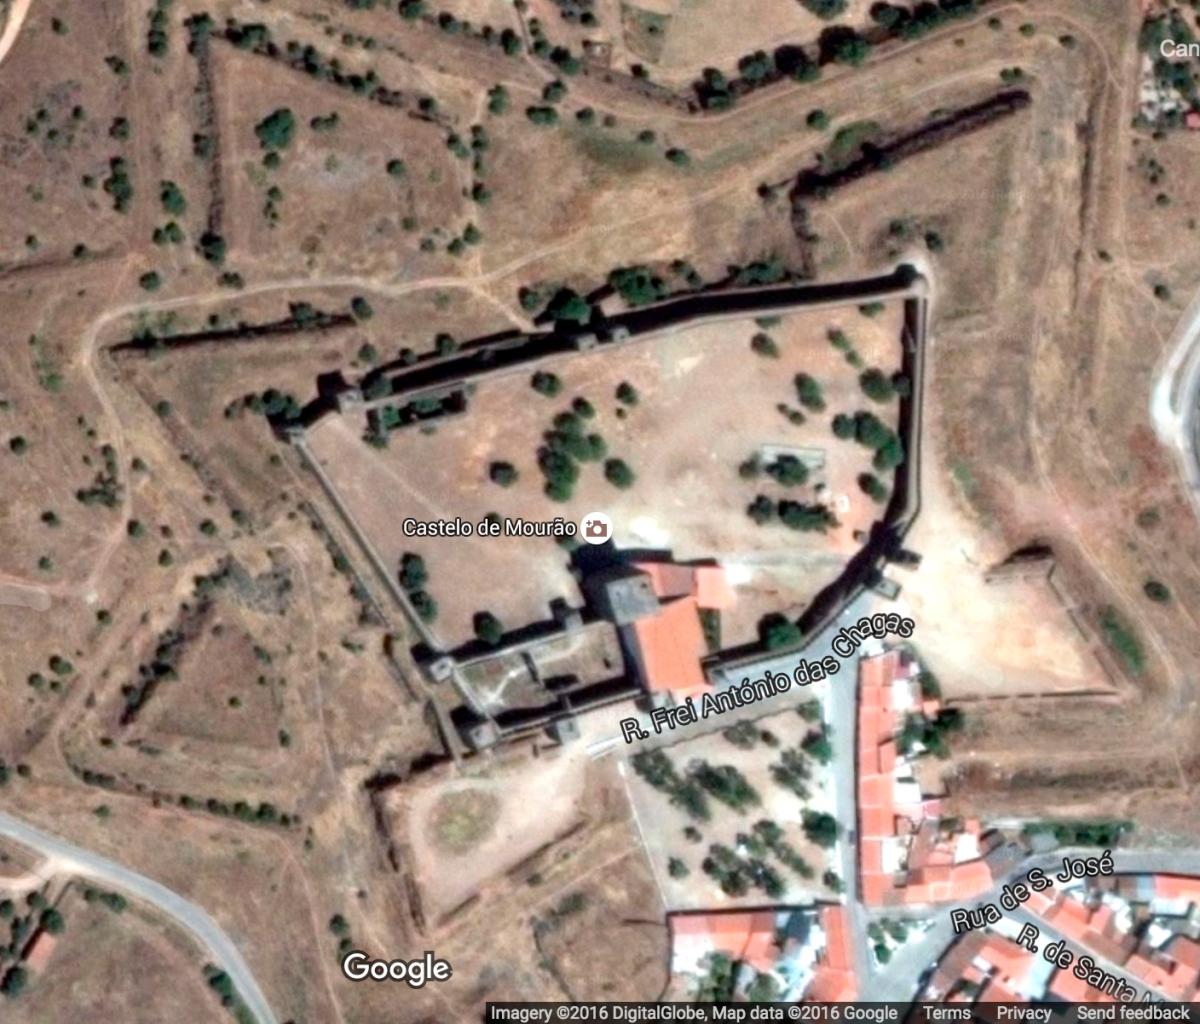 Mourao Castle, Google Maps